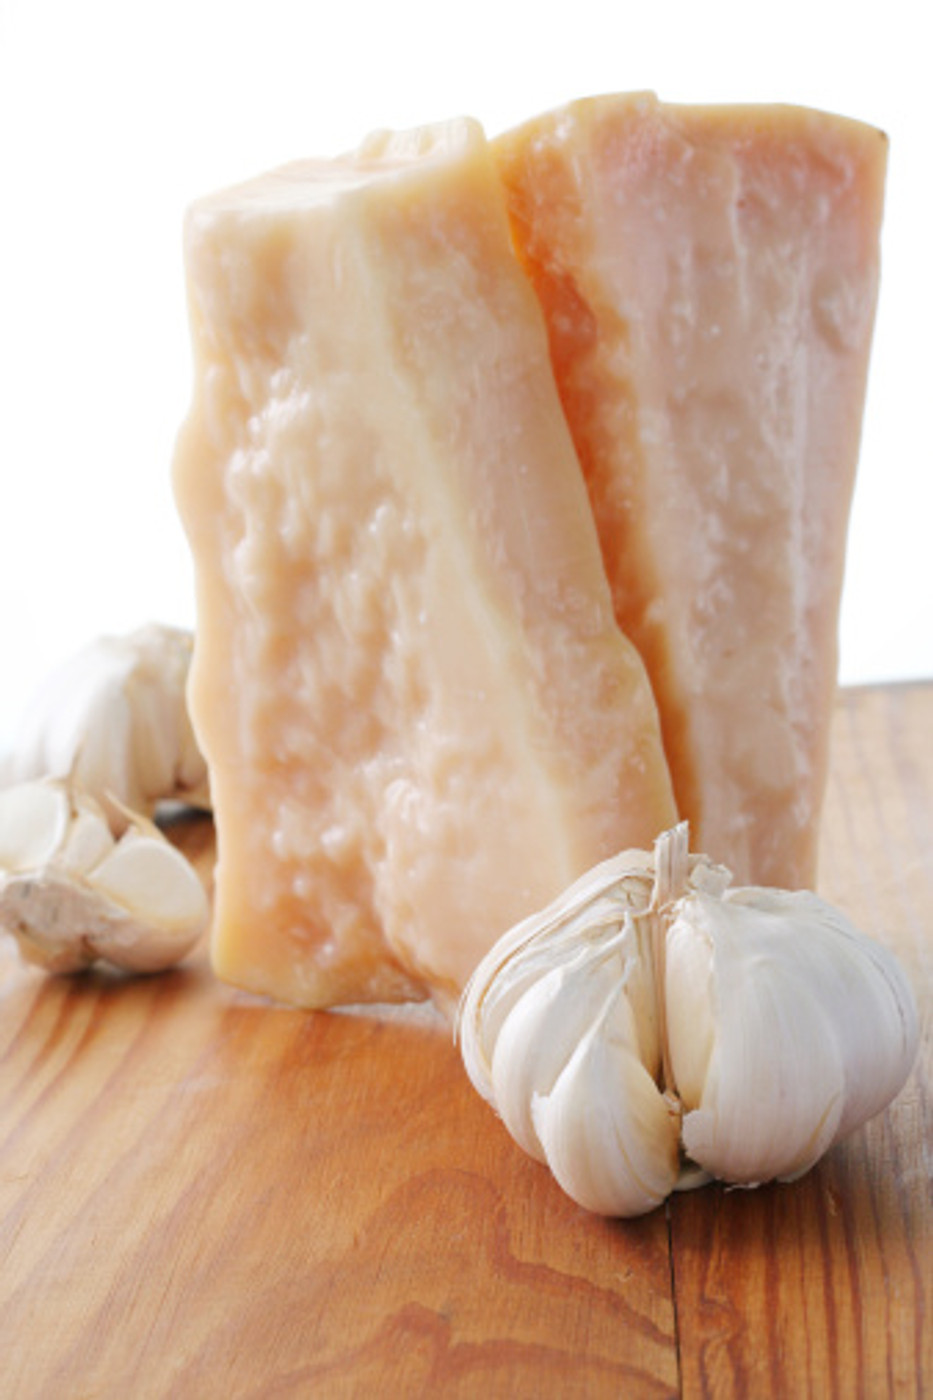 Parmesan and Garlic Olive Oil